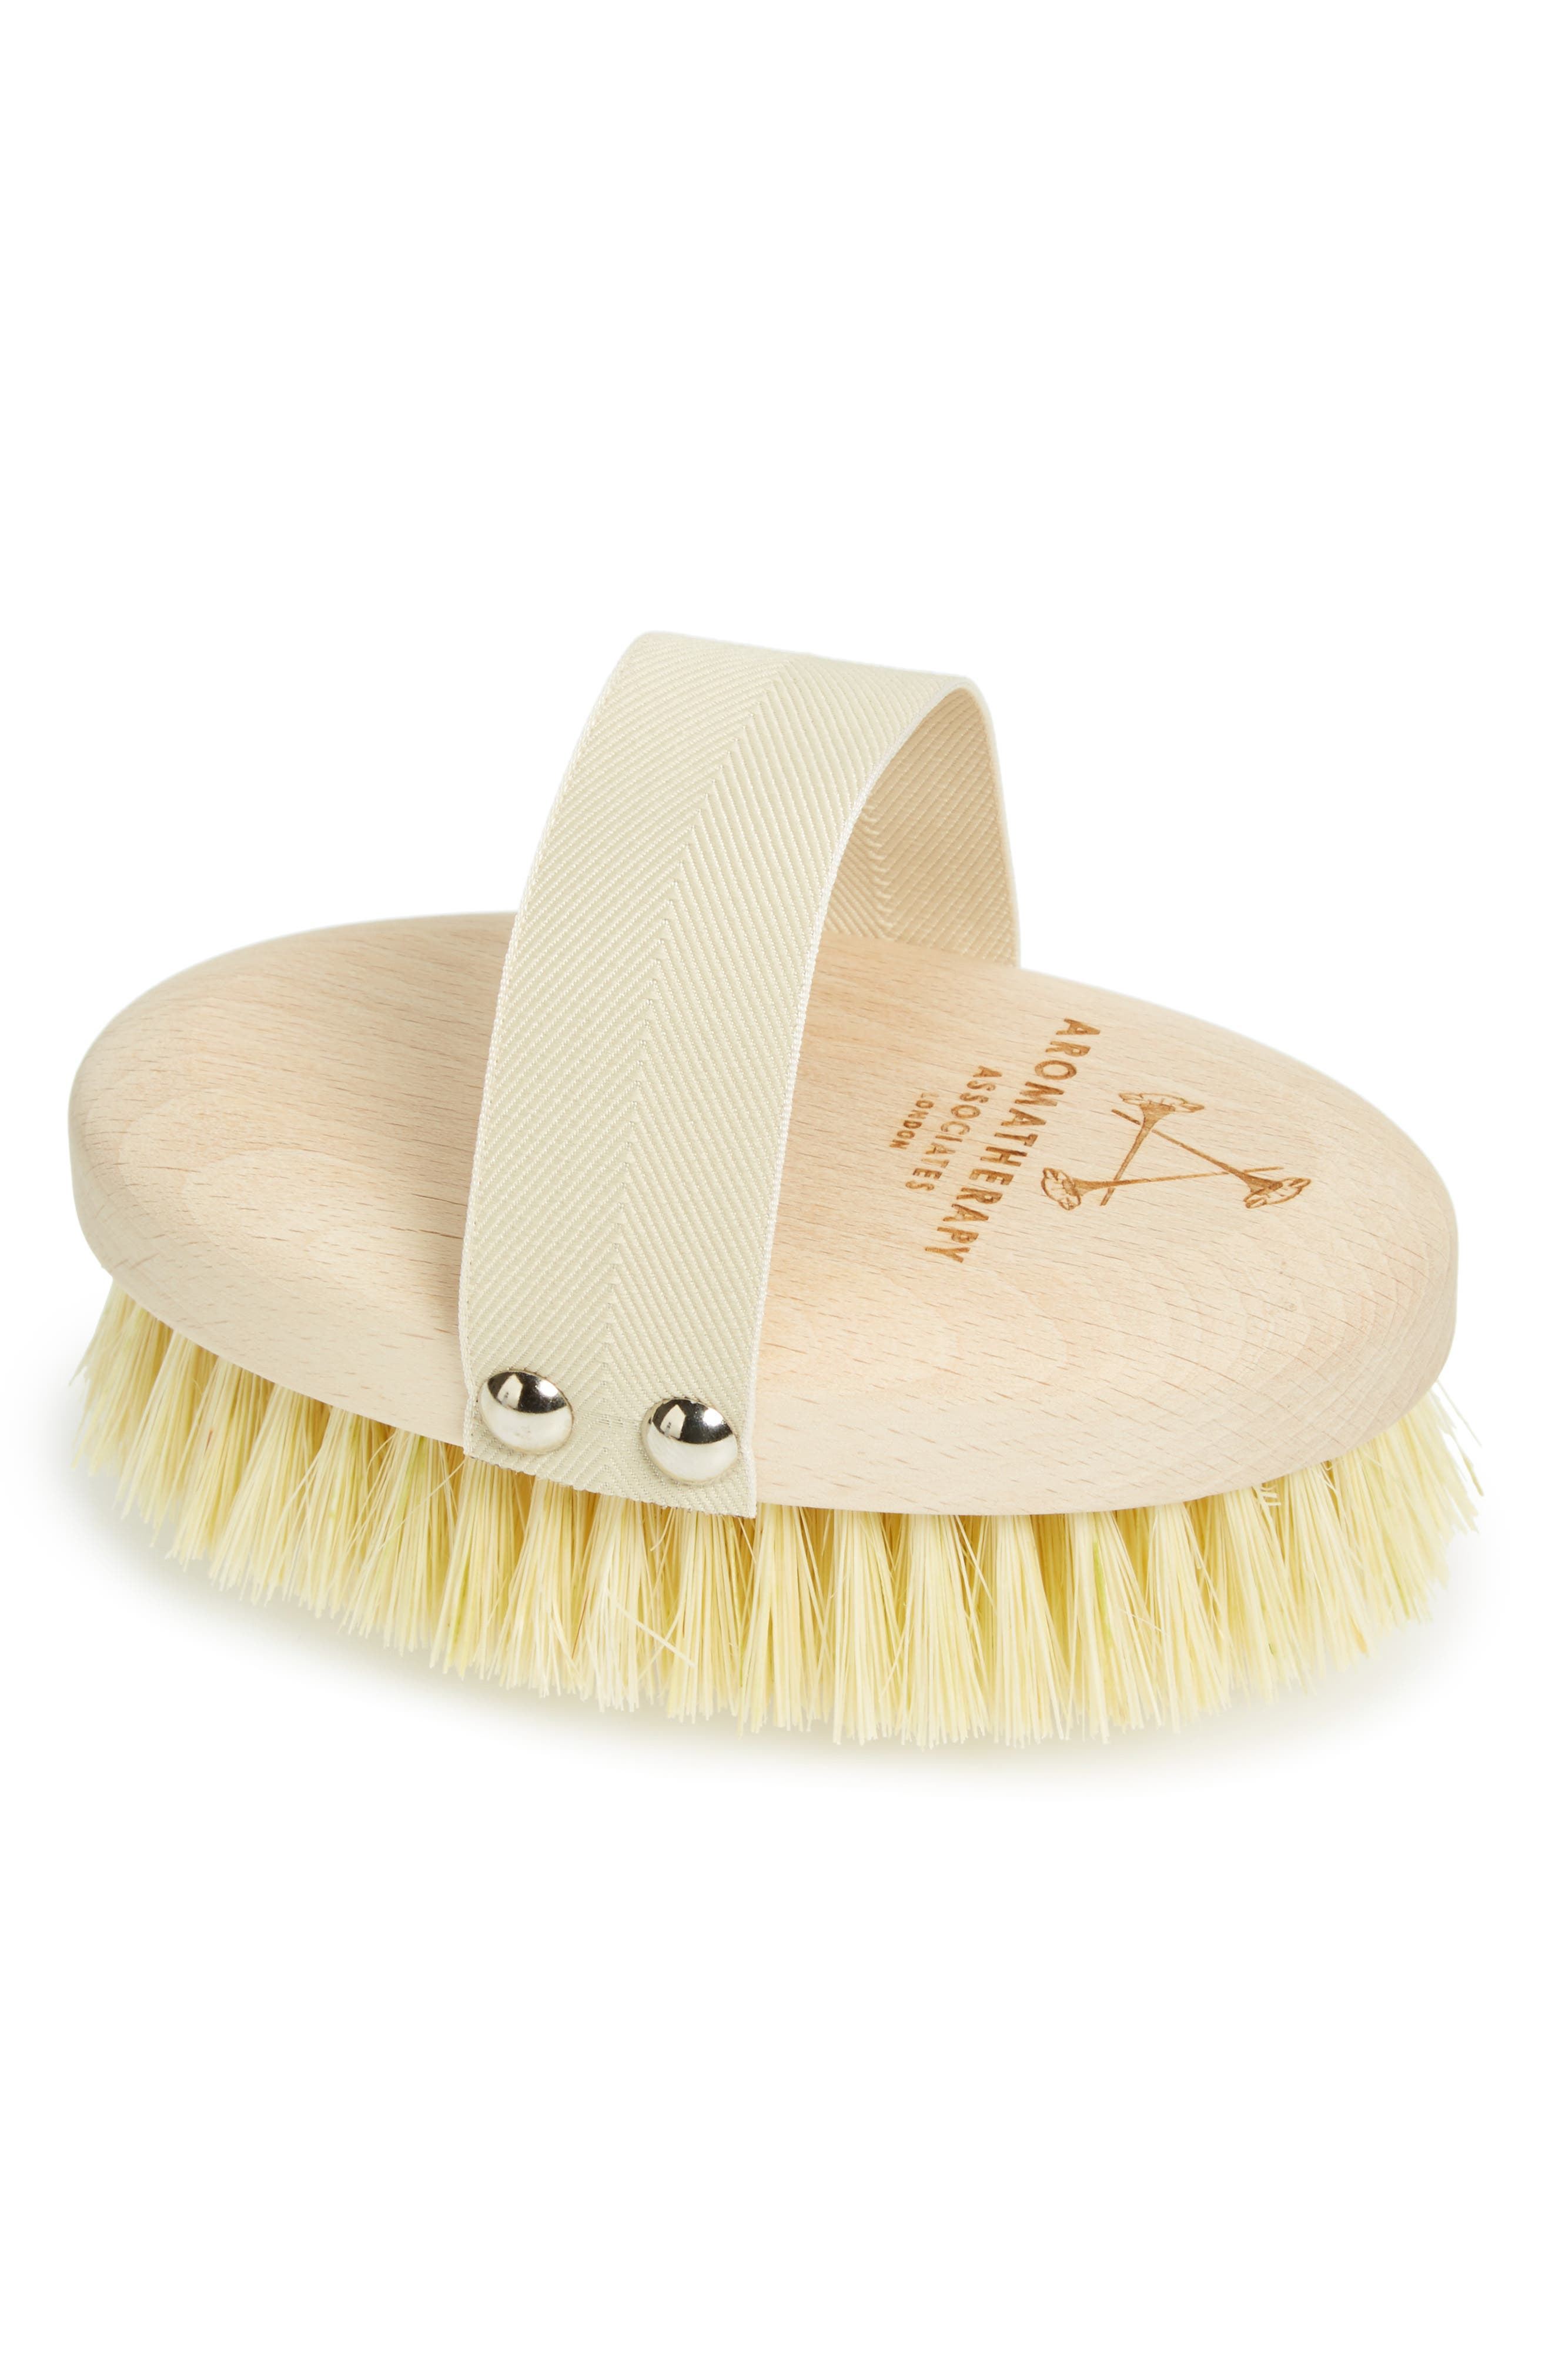 Polishing Body Brush,                         Main,                         color, NONE